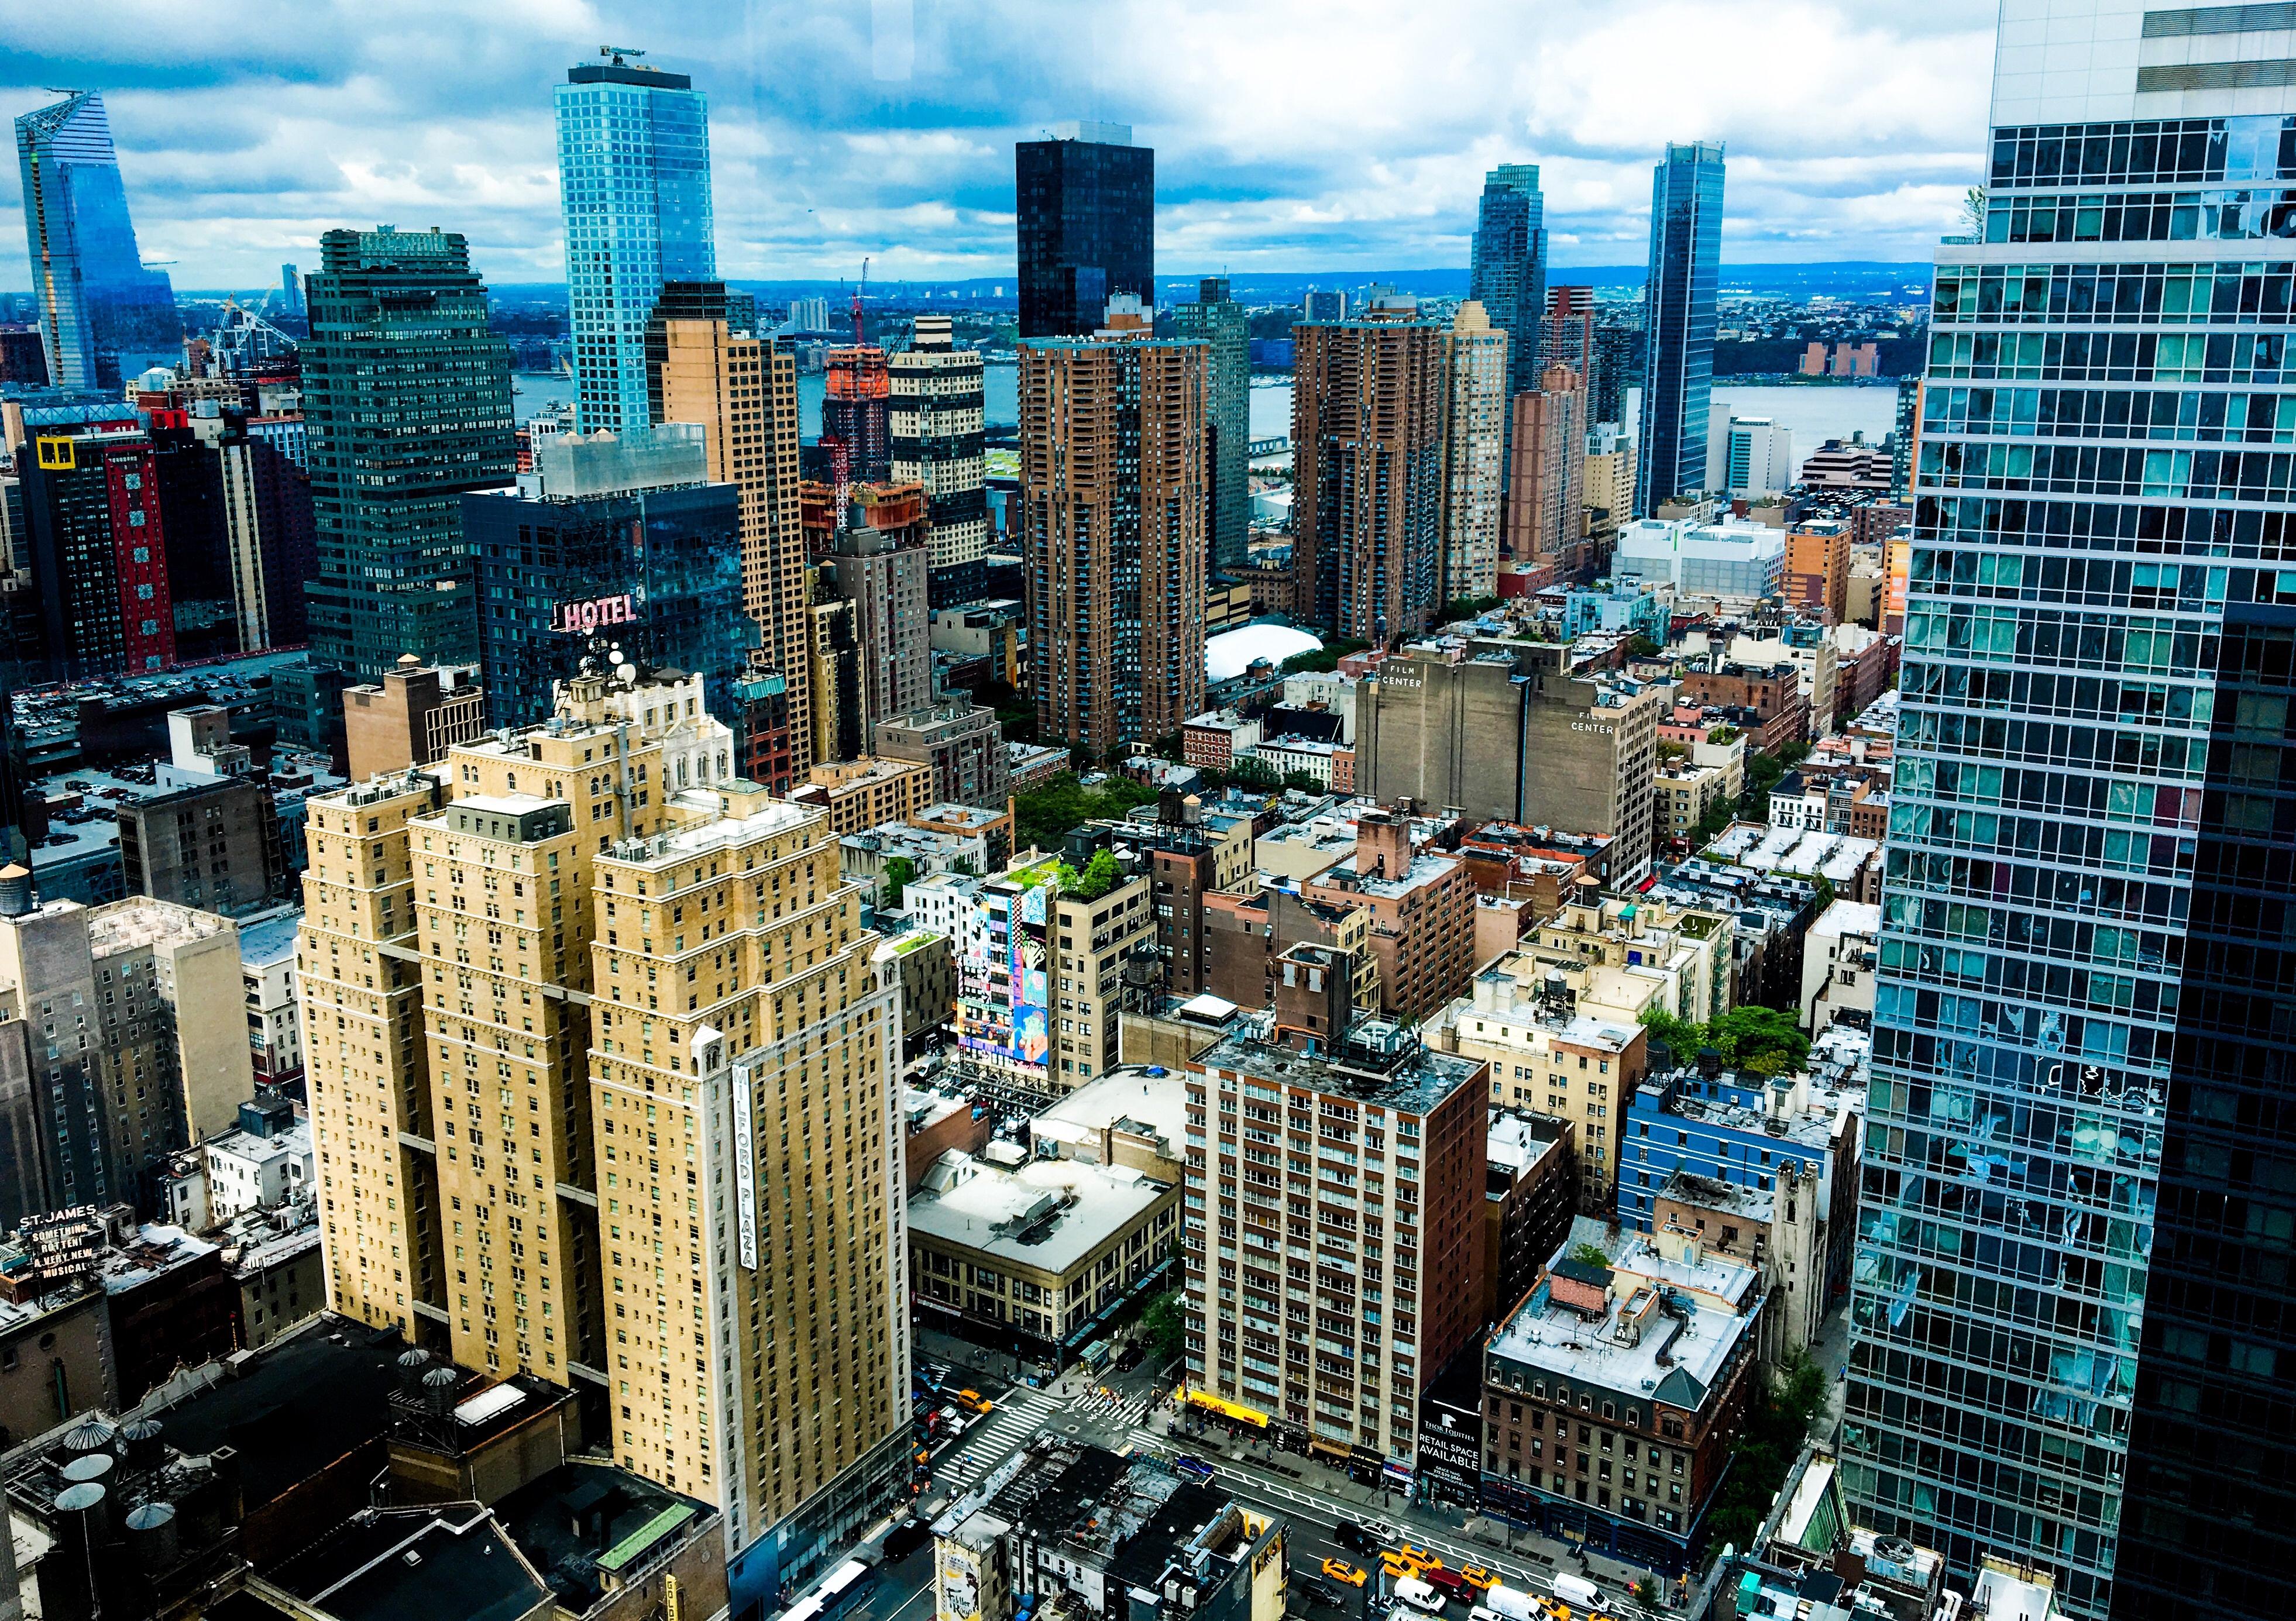 Super New York Multilingual Escorted Tour - New York City